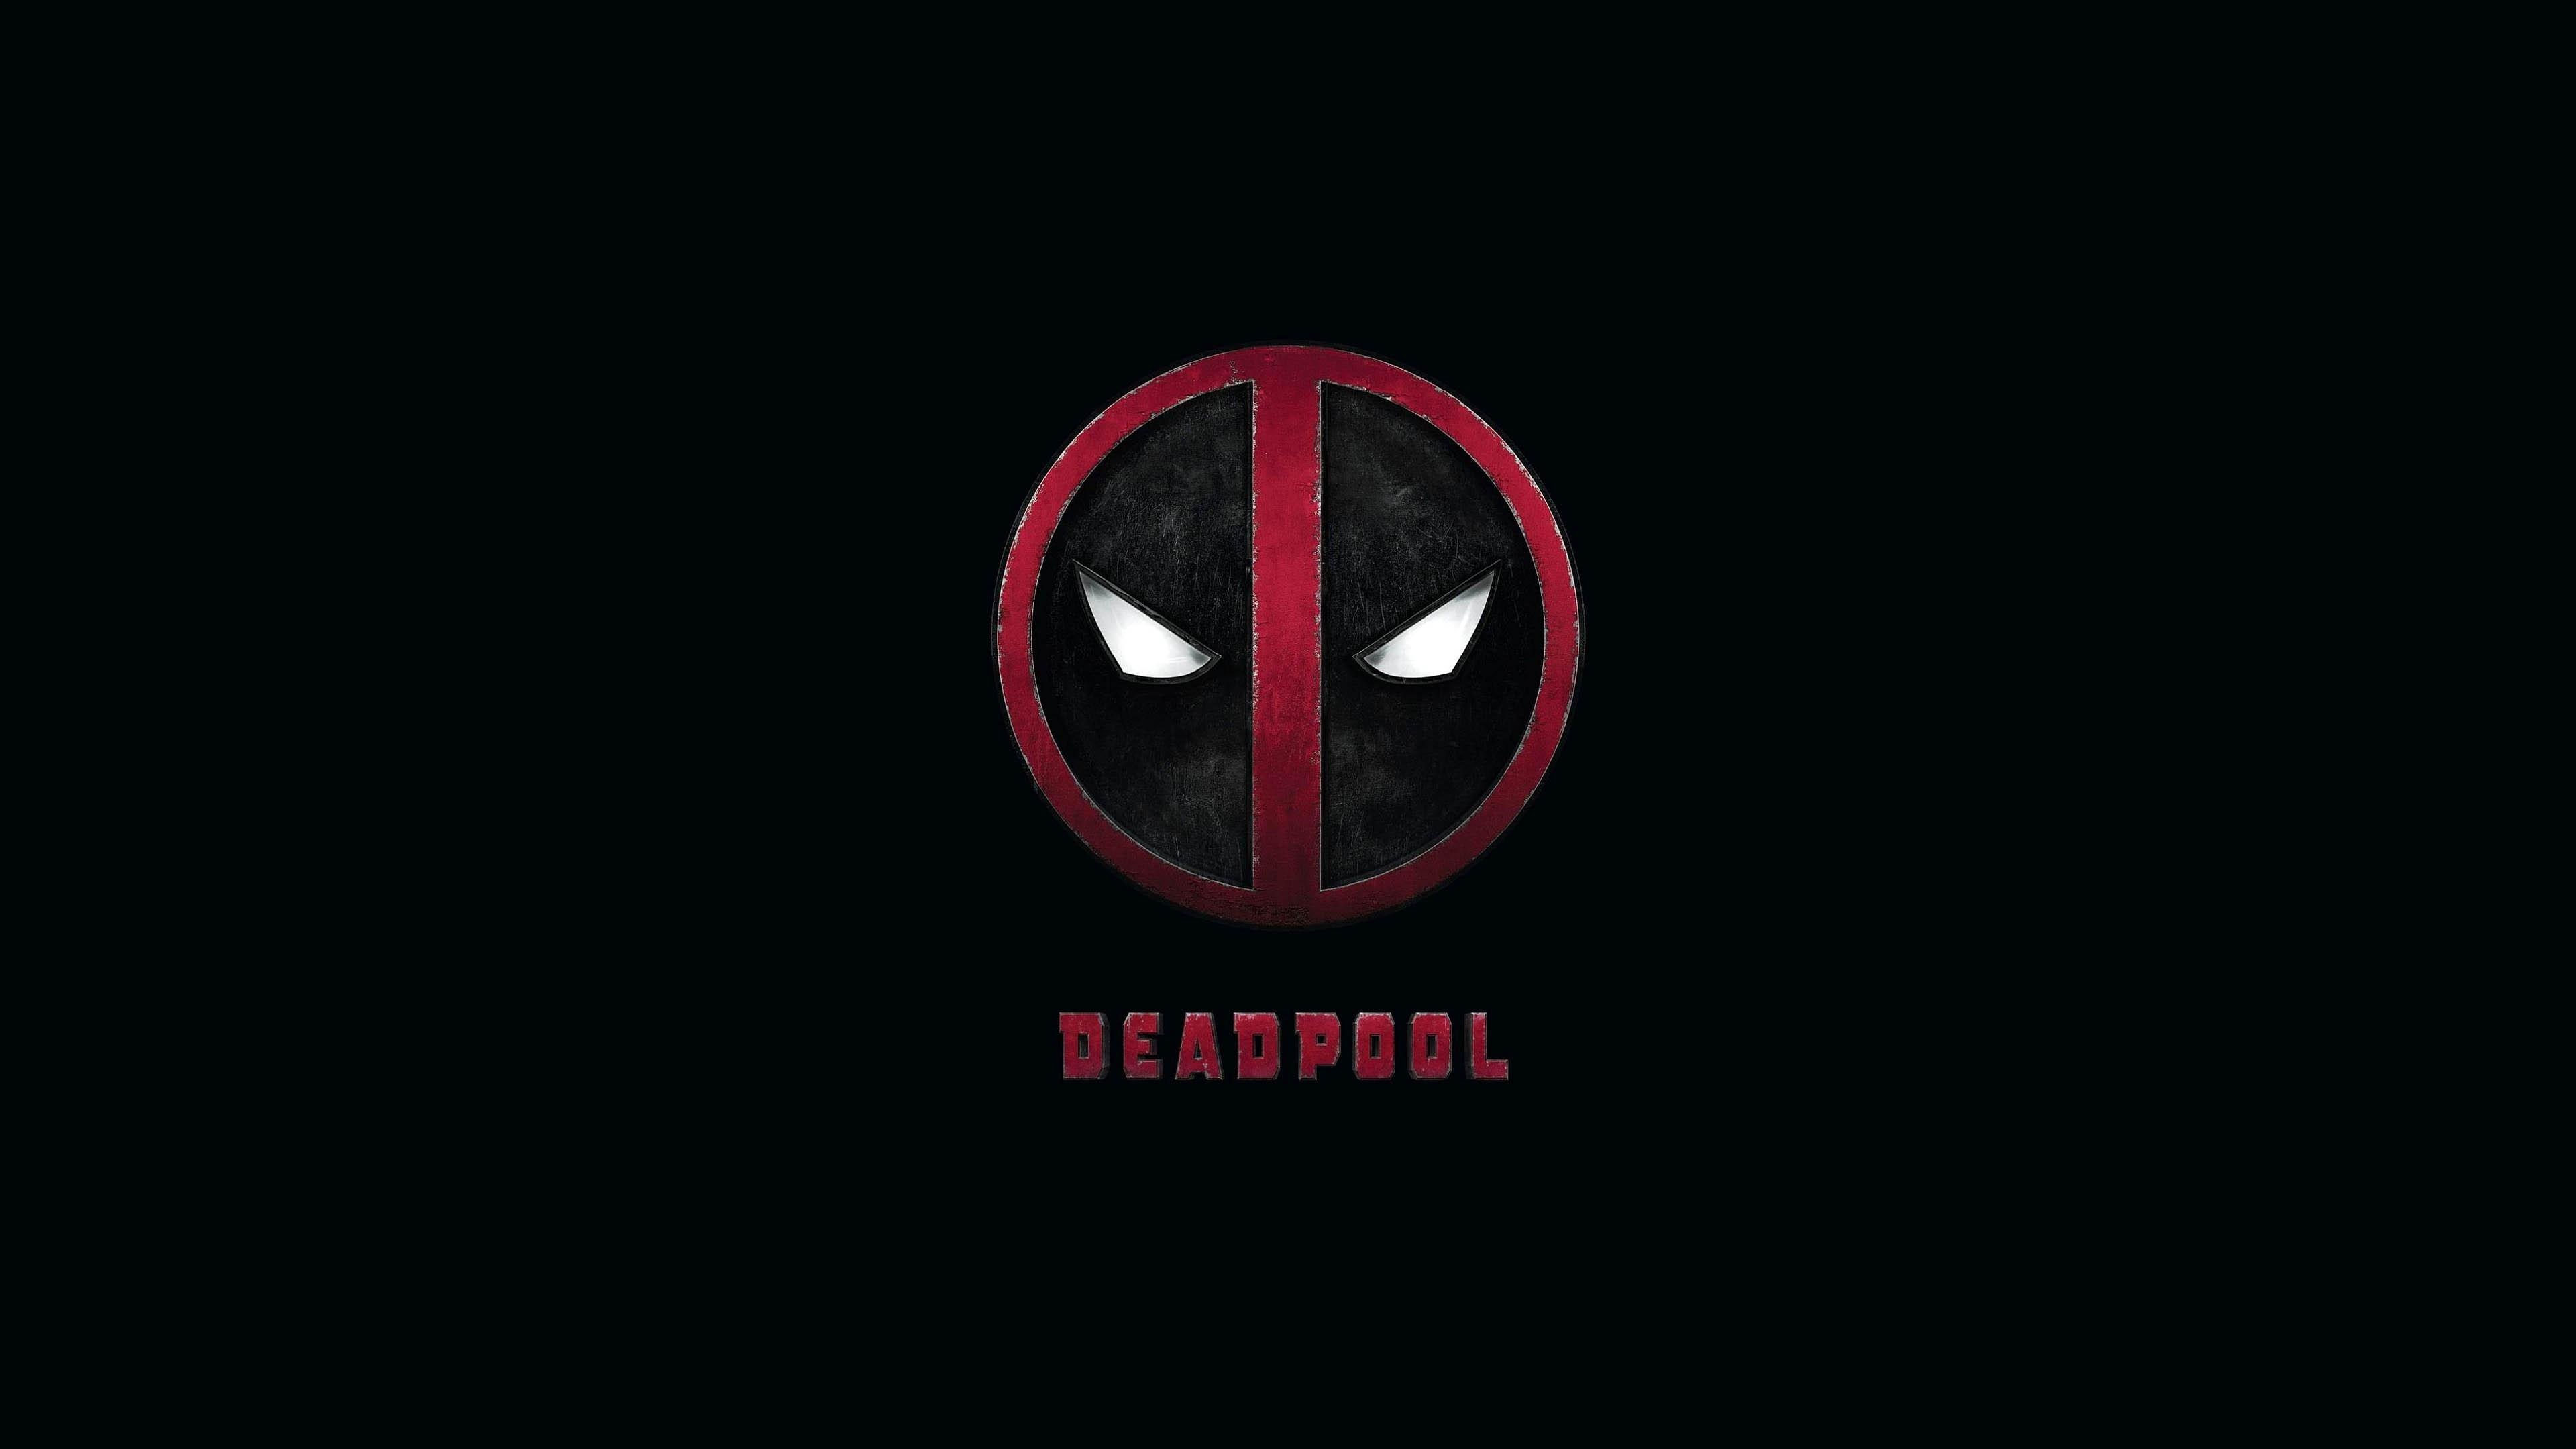 deadpool movie logo wallpaper for android ~ desktop wallpaper box